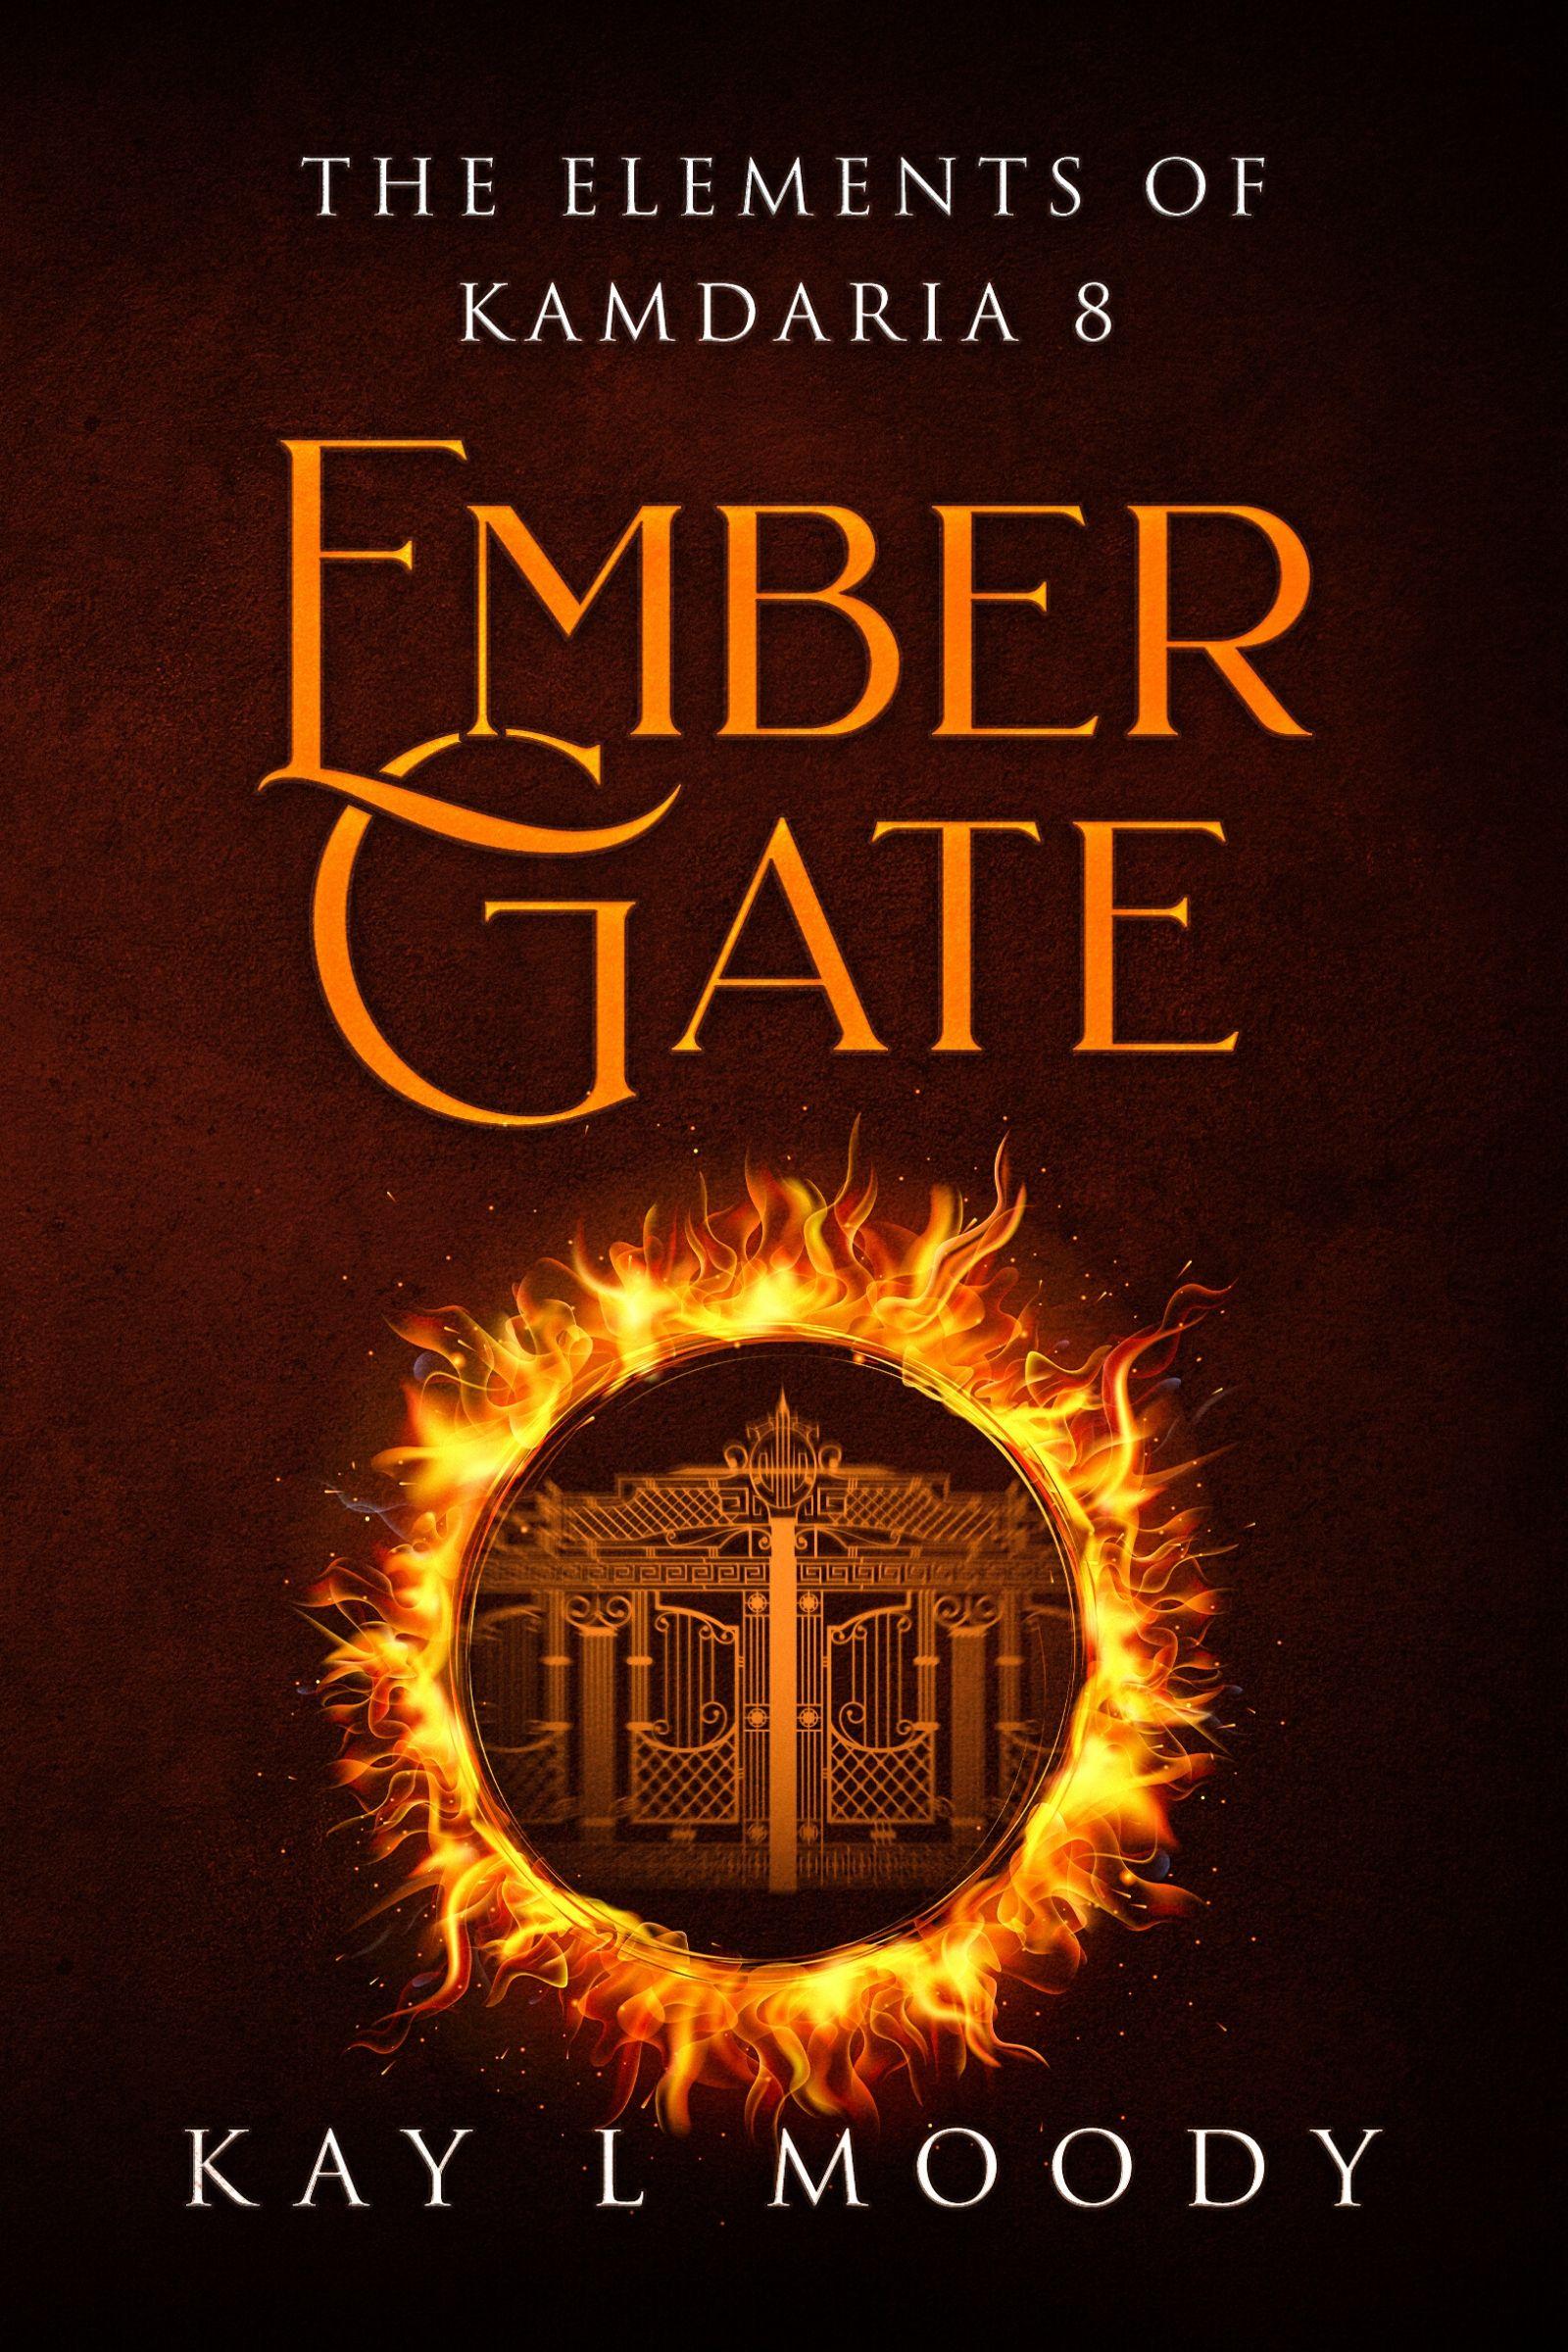 Ember Gate  - Kay L Moody